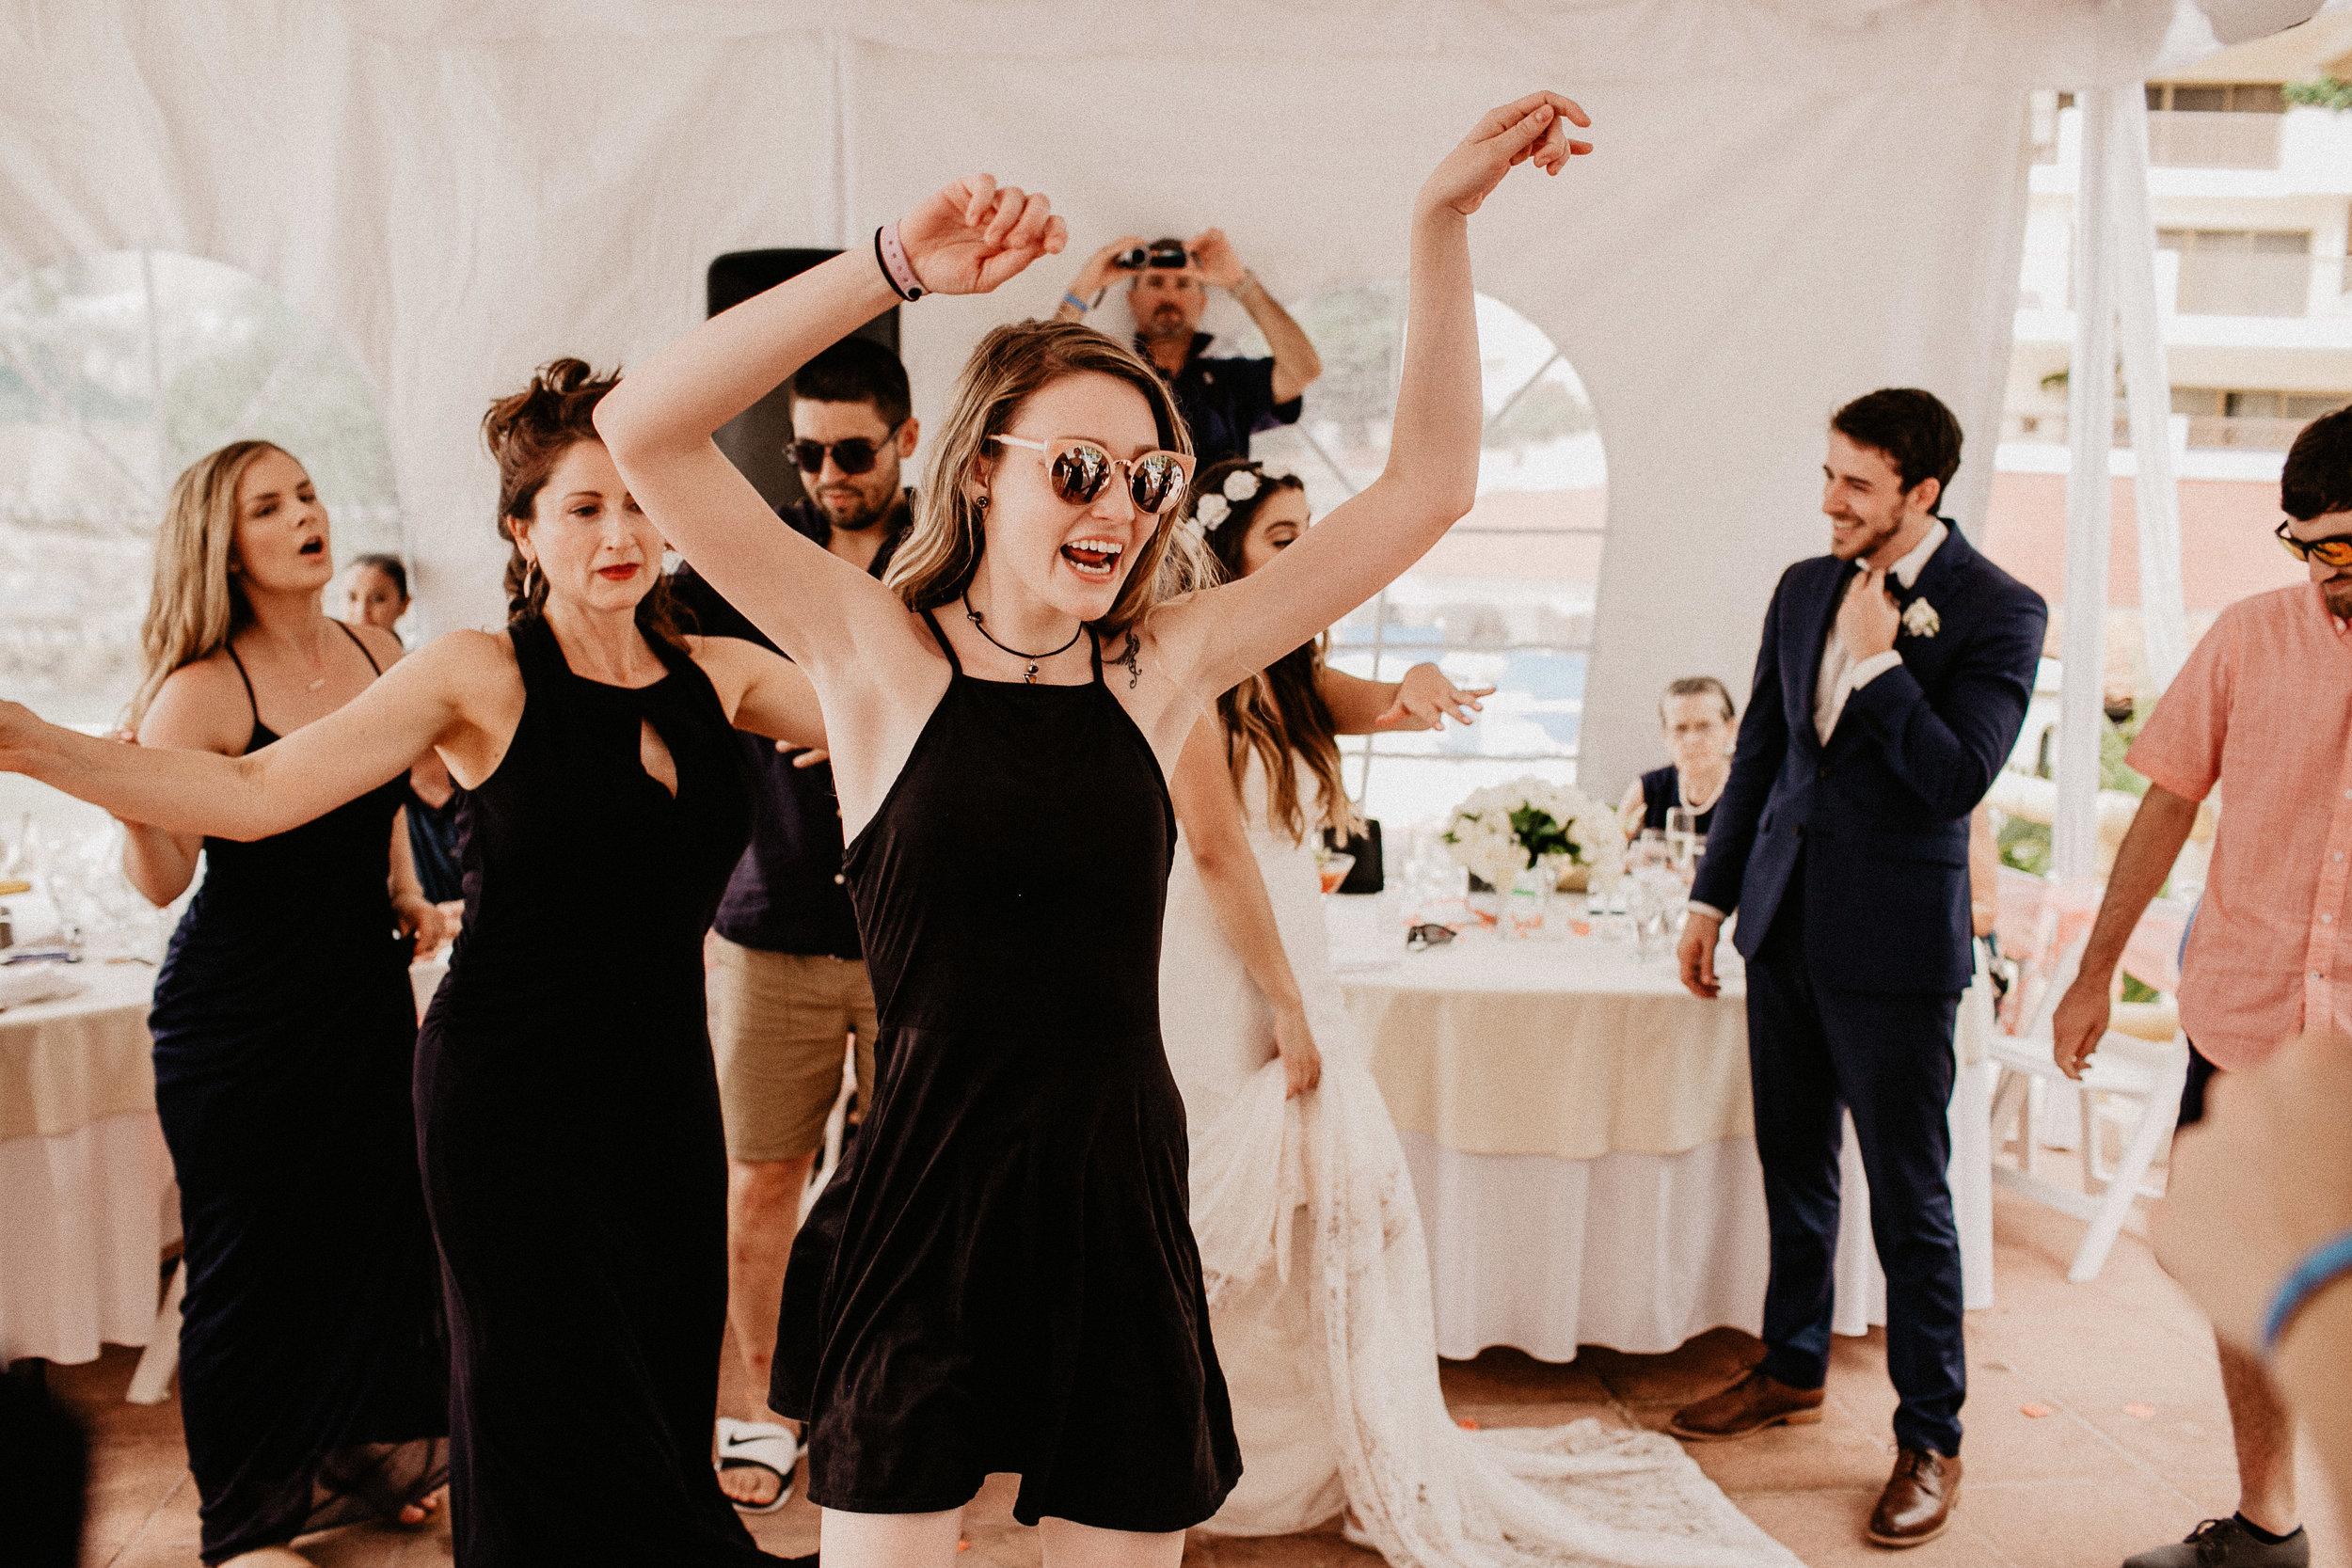 alfonso_flores_destination_wedding_photography_puerto_vallarta_hotel_barcelo_vallarta_cuttler_amela-538.JPG